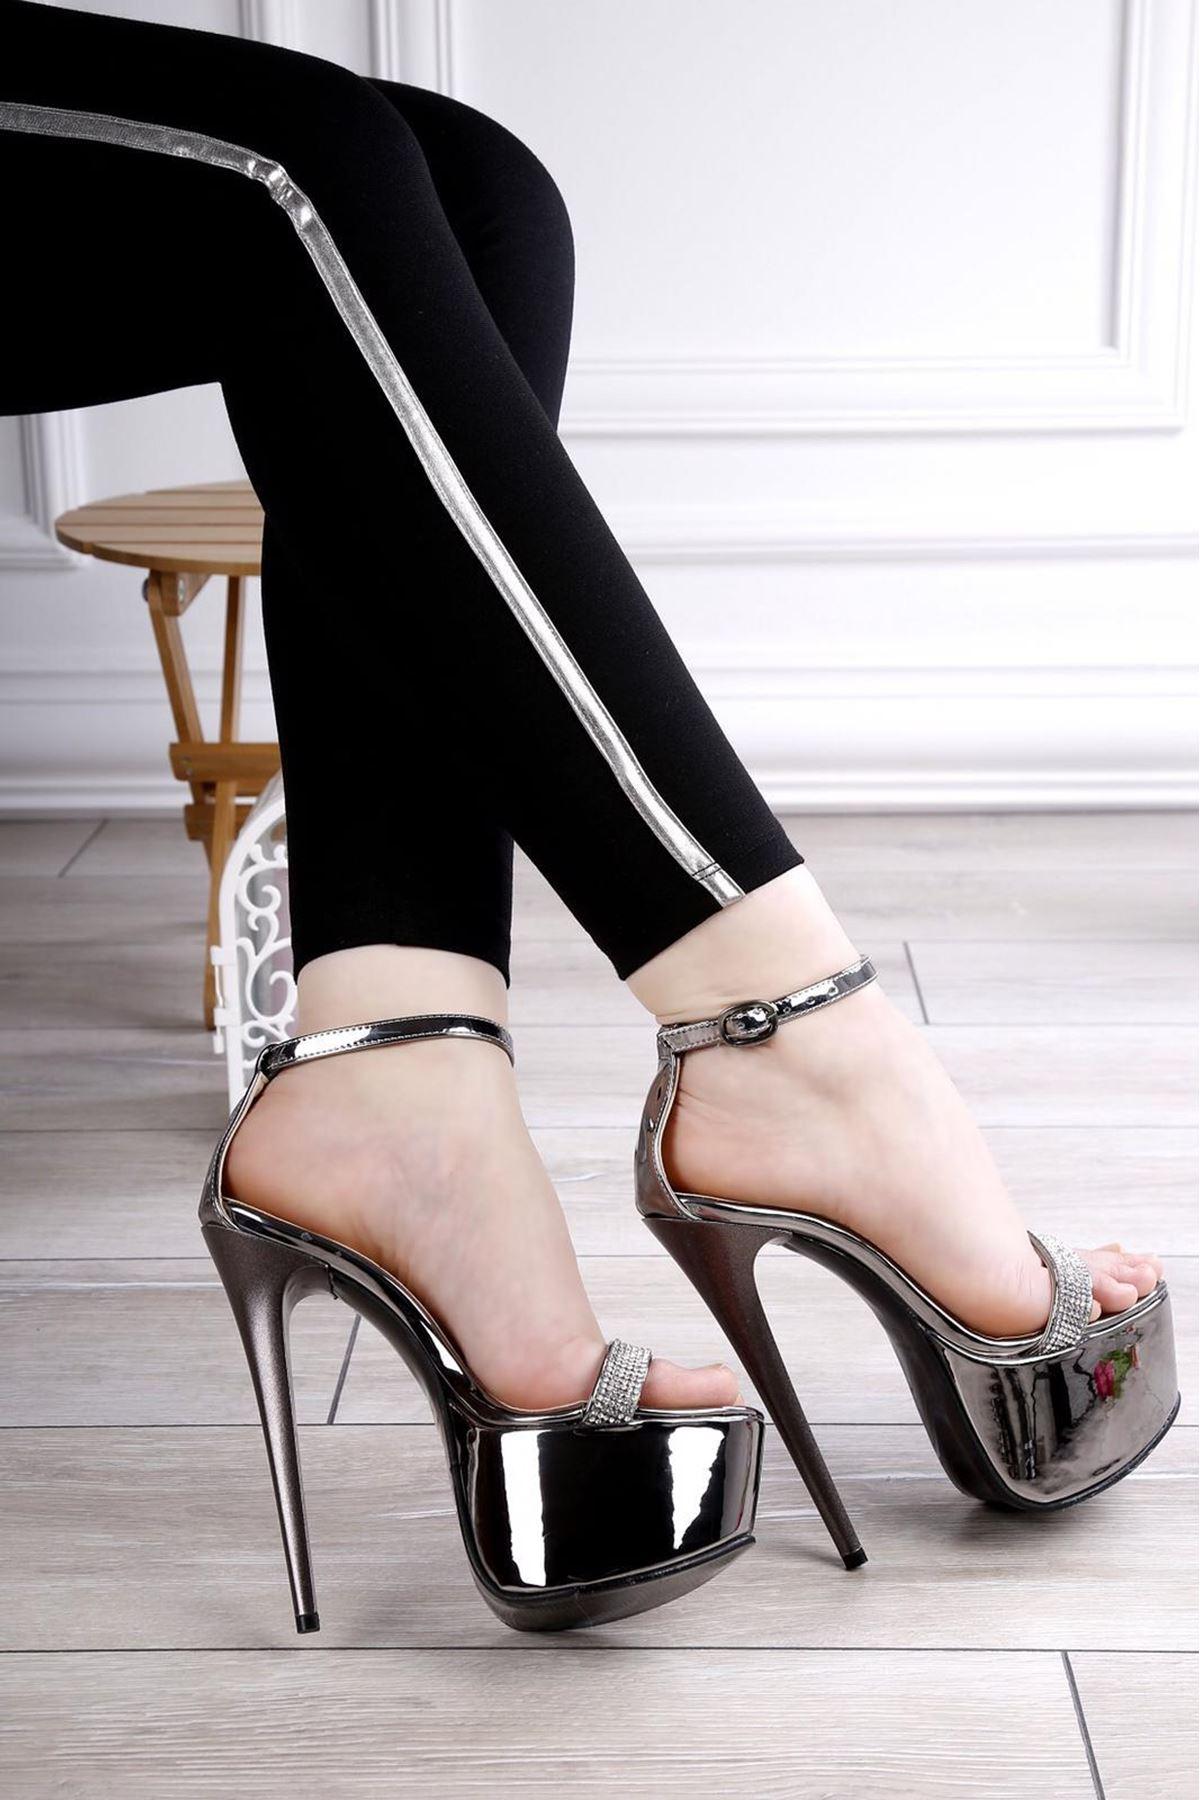 CİSİL GÜMÜŞ Platform Topuklu Ayakkabı